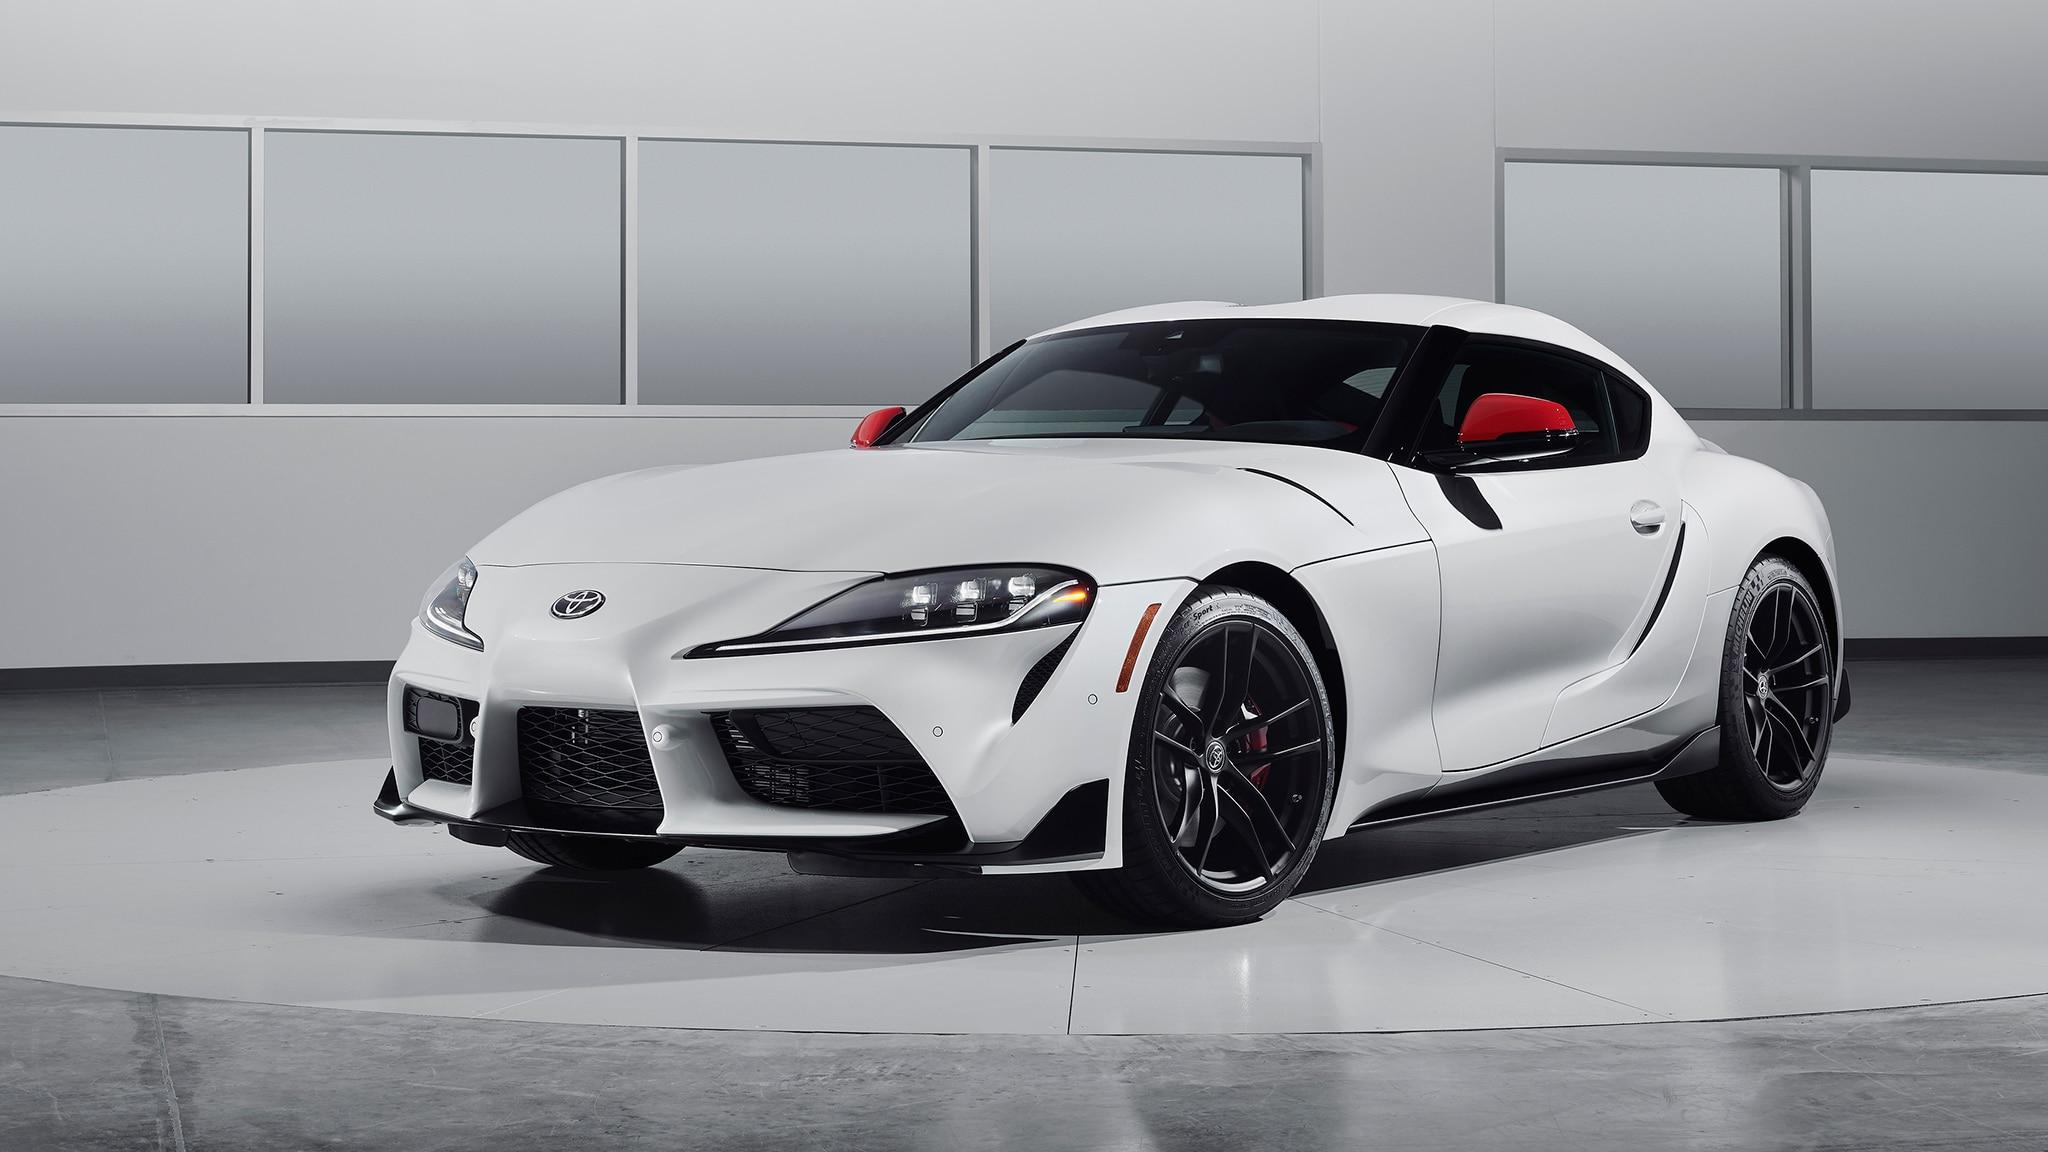 2020 Toyota Supra Launch Edition 03